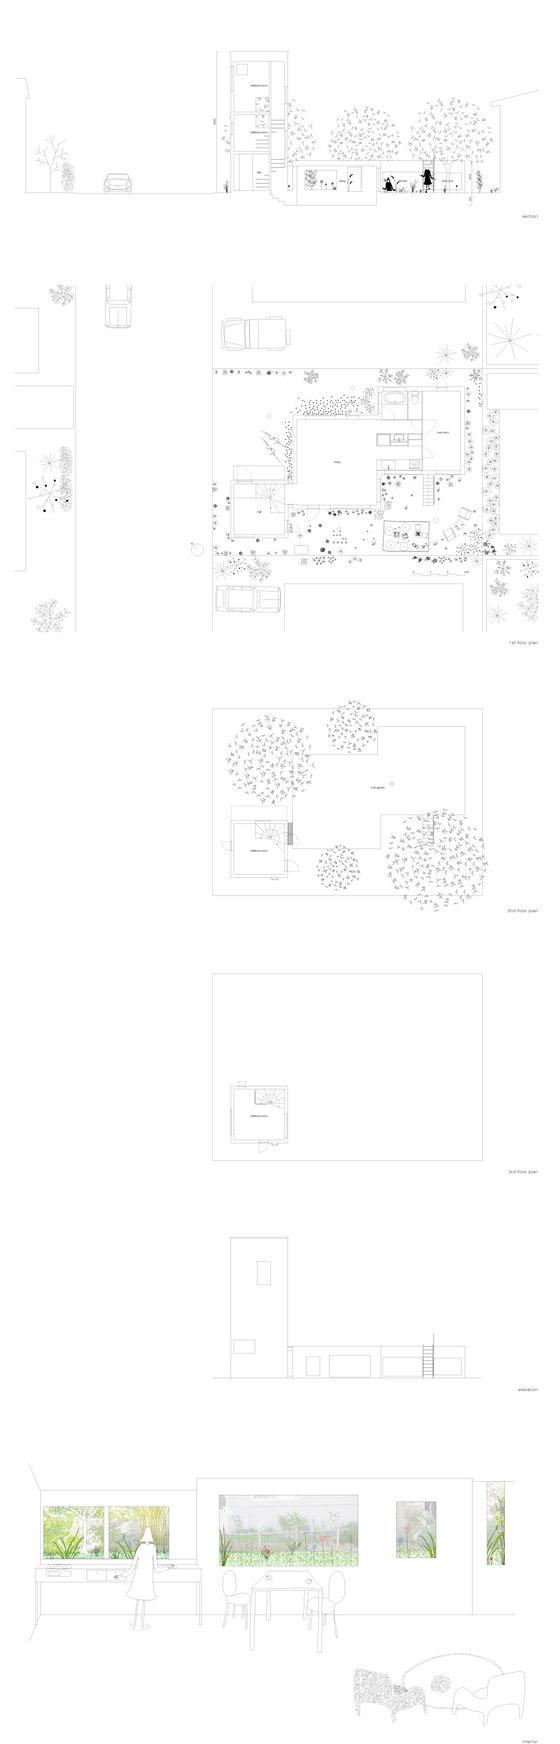 Kumagai House von Hiroshi Kuno + Associates | Einfamilienhäuser